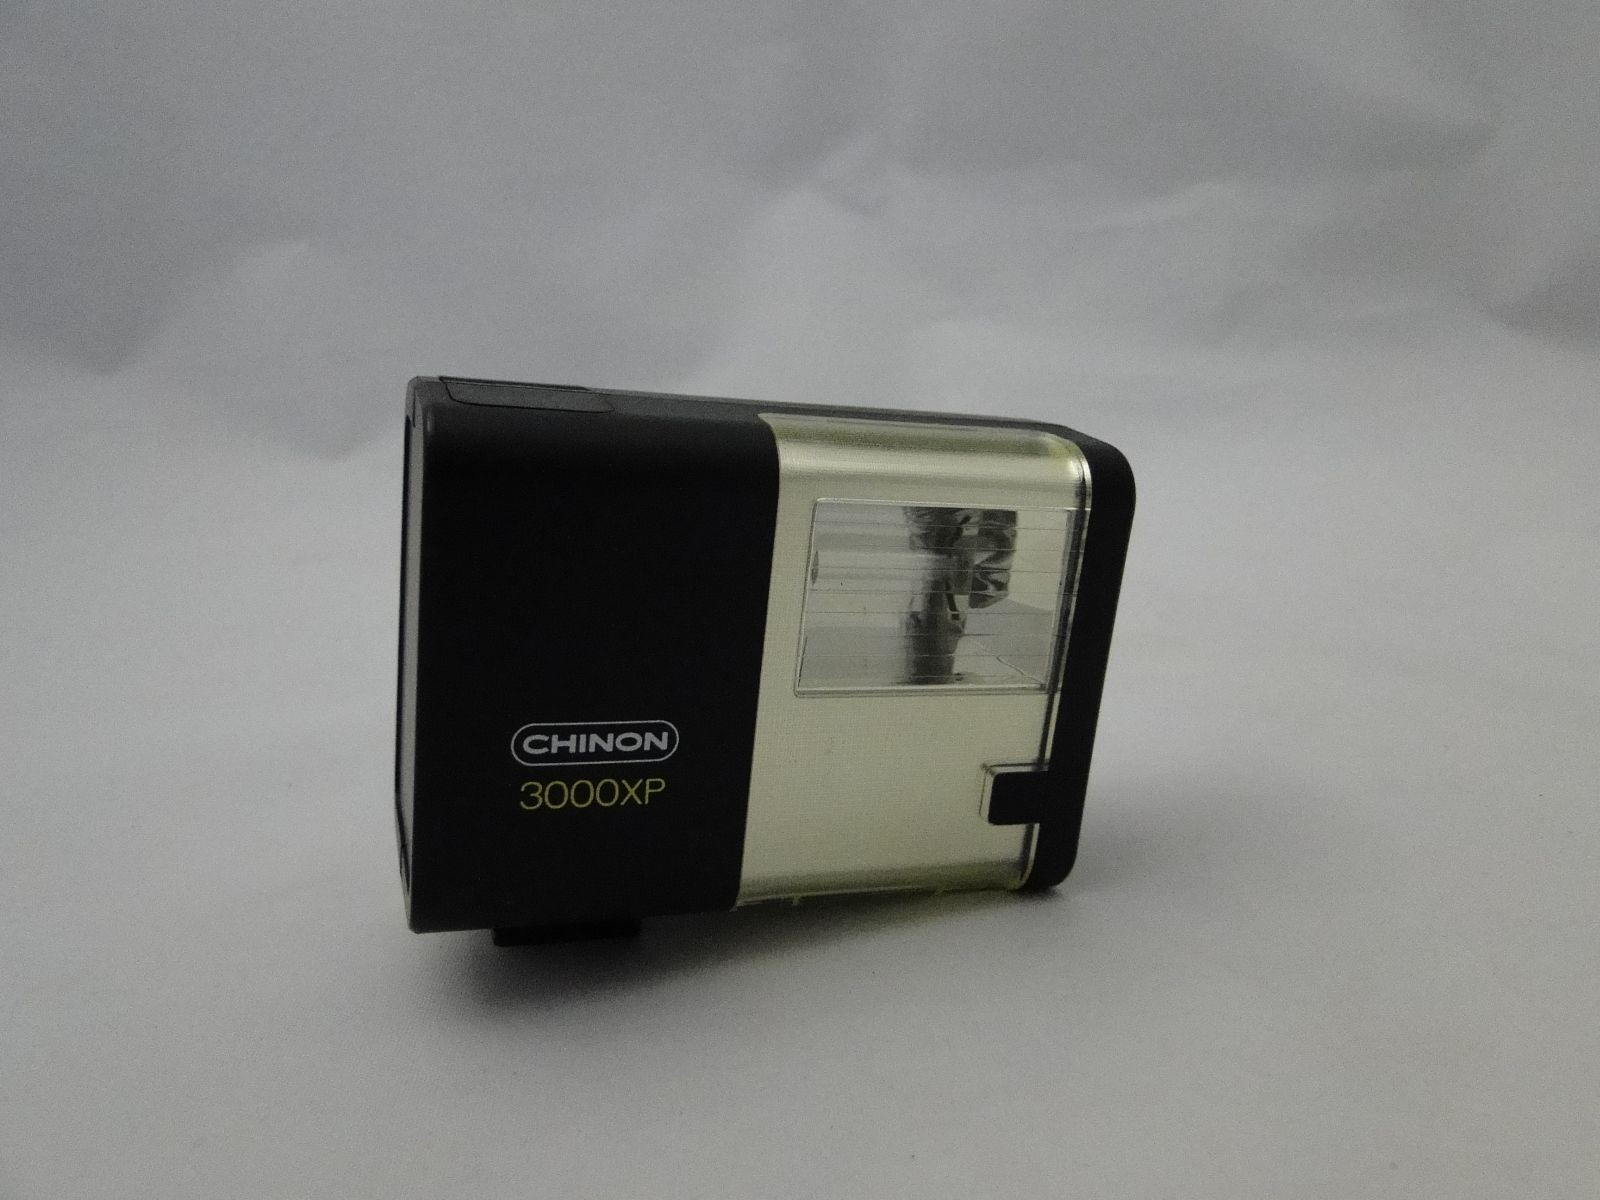 DSC08372.JPG (1600�1200)